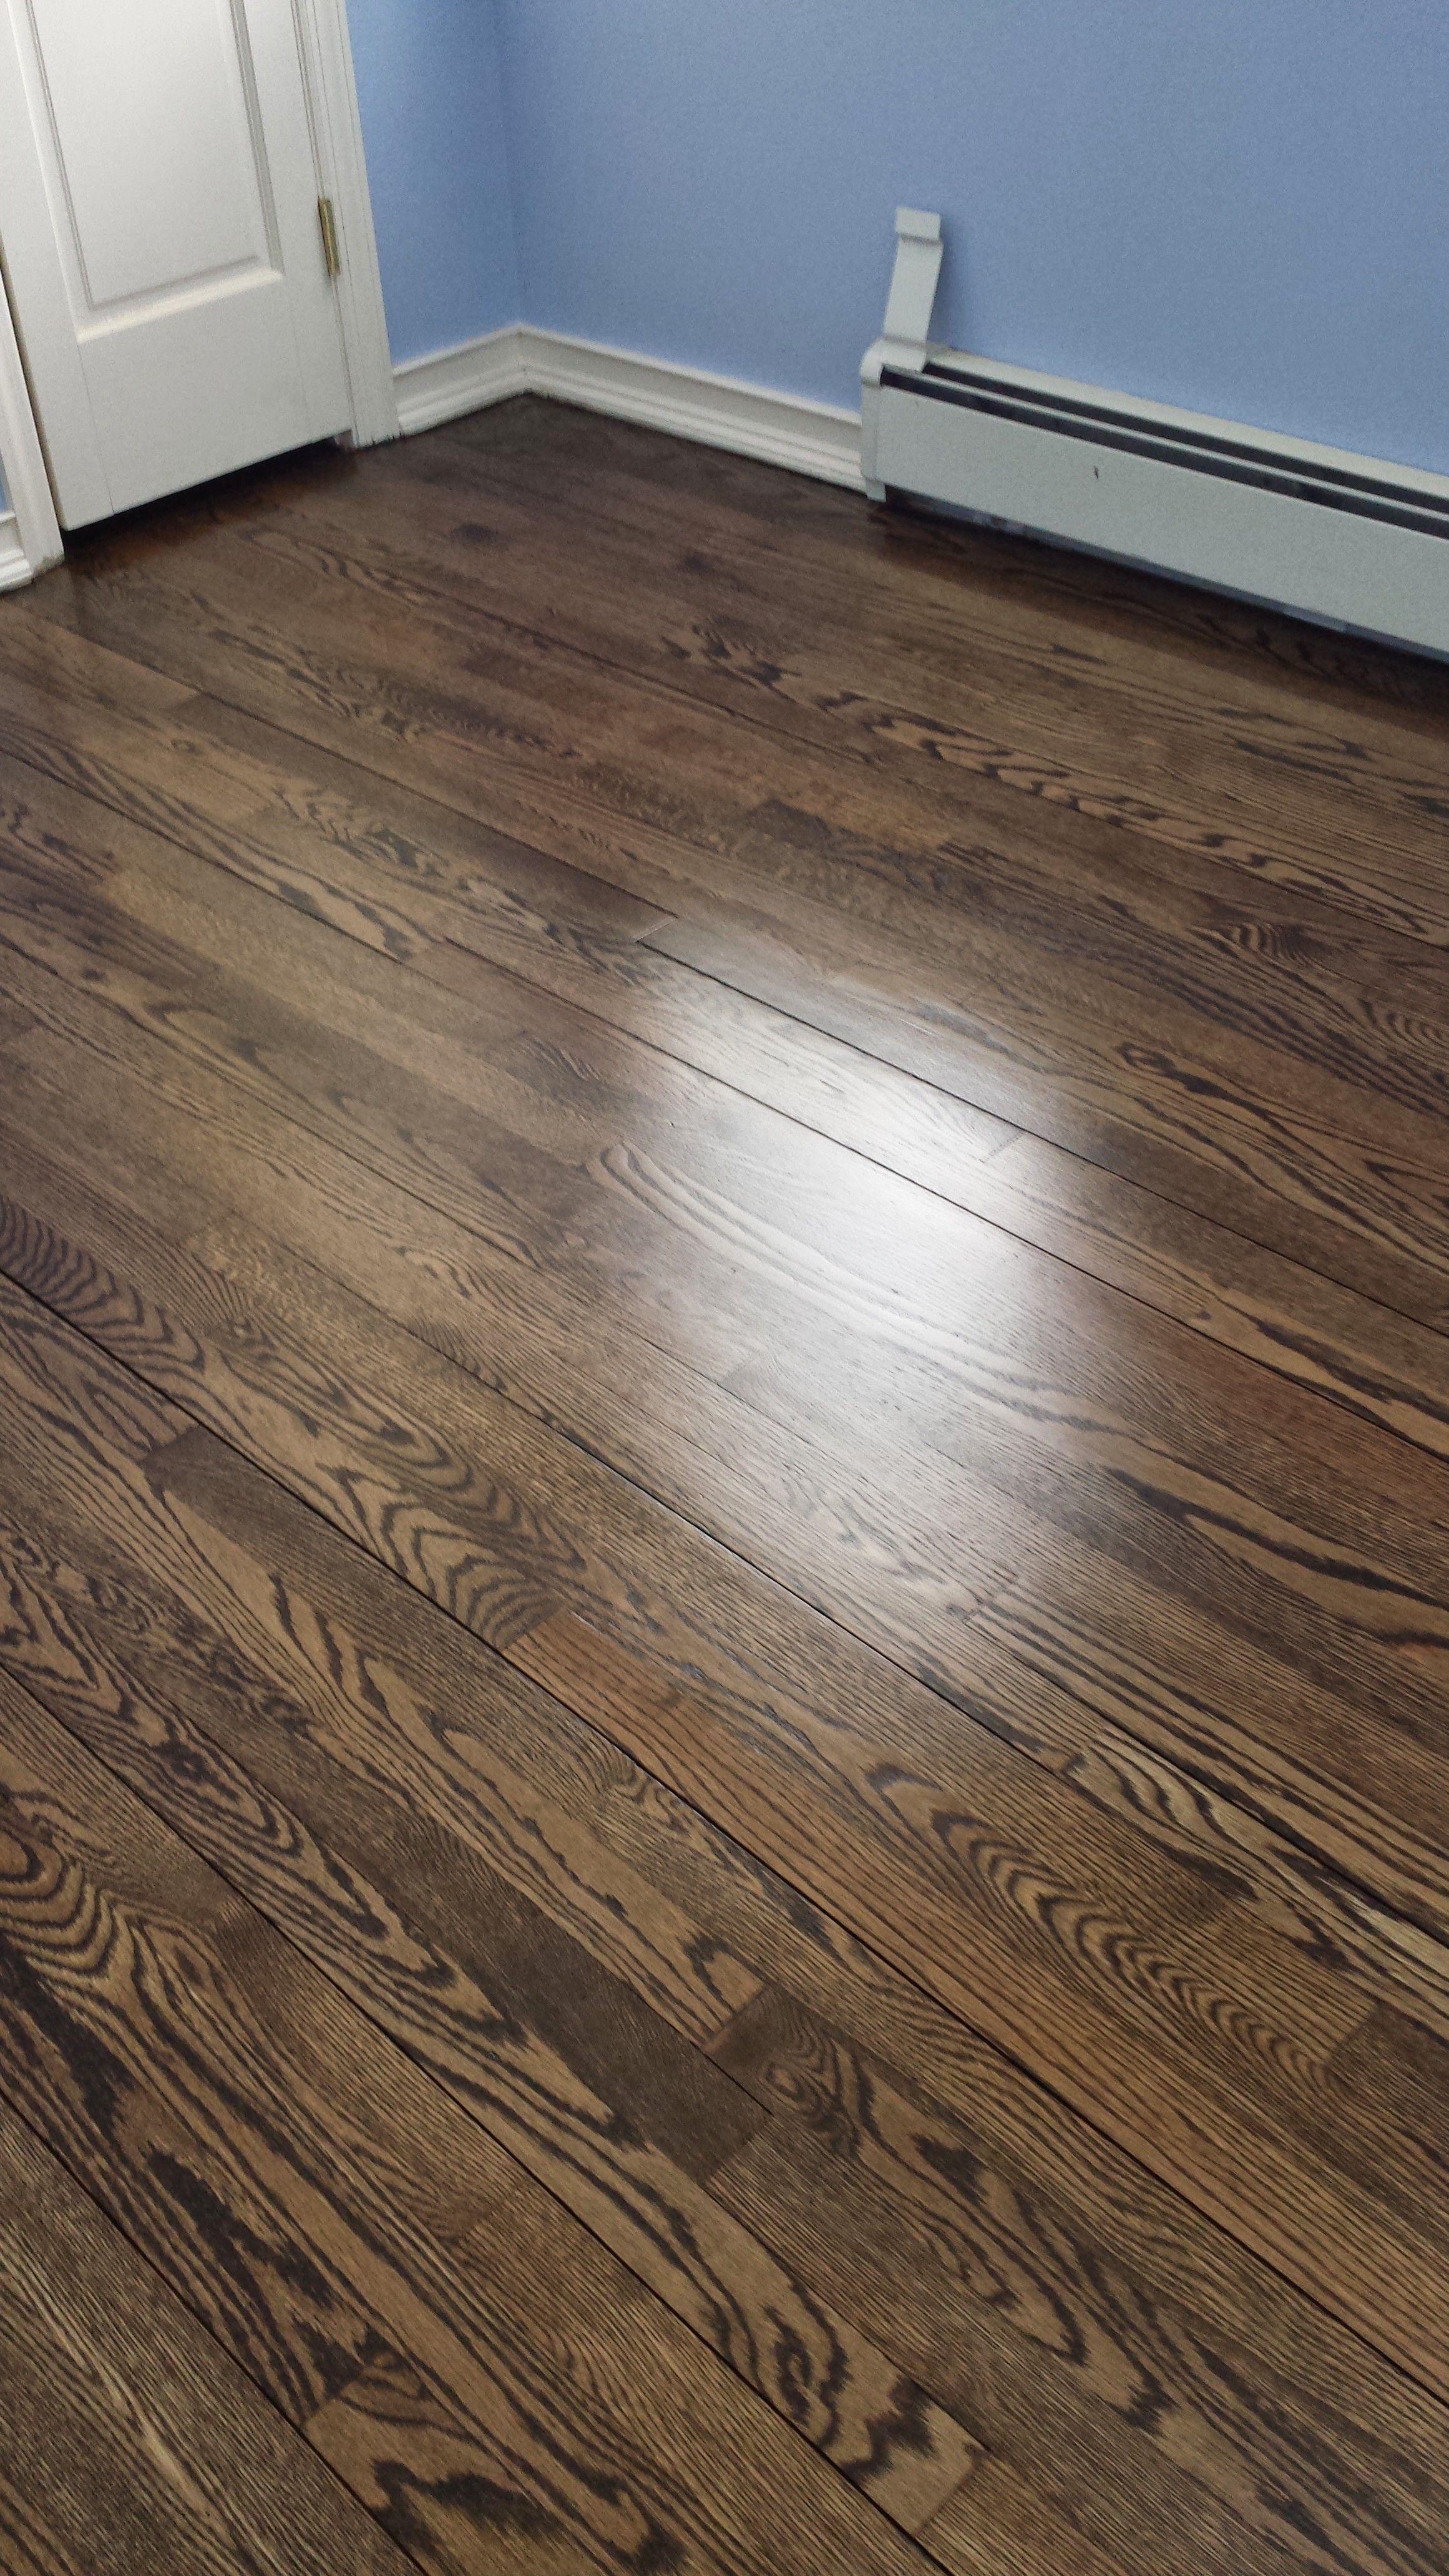 hardwood floor repair refinishing of wood floor refinishing hardwood floor repair floor plan ideas inside 20 s of the hardwood floor repair